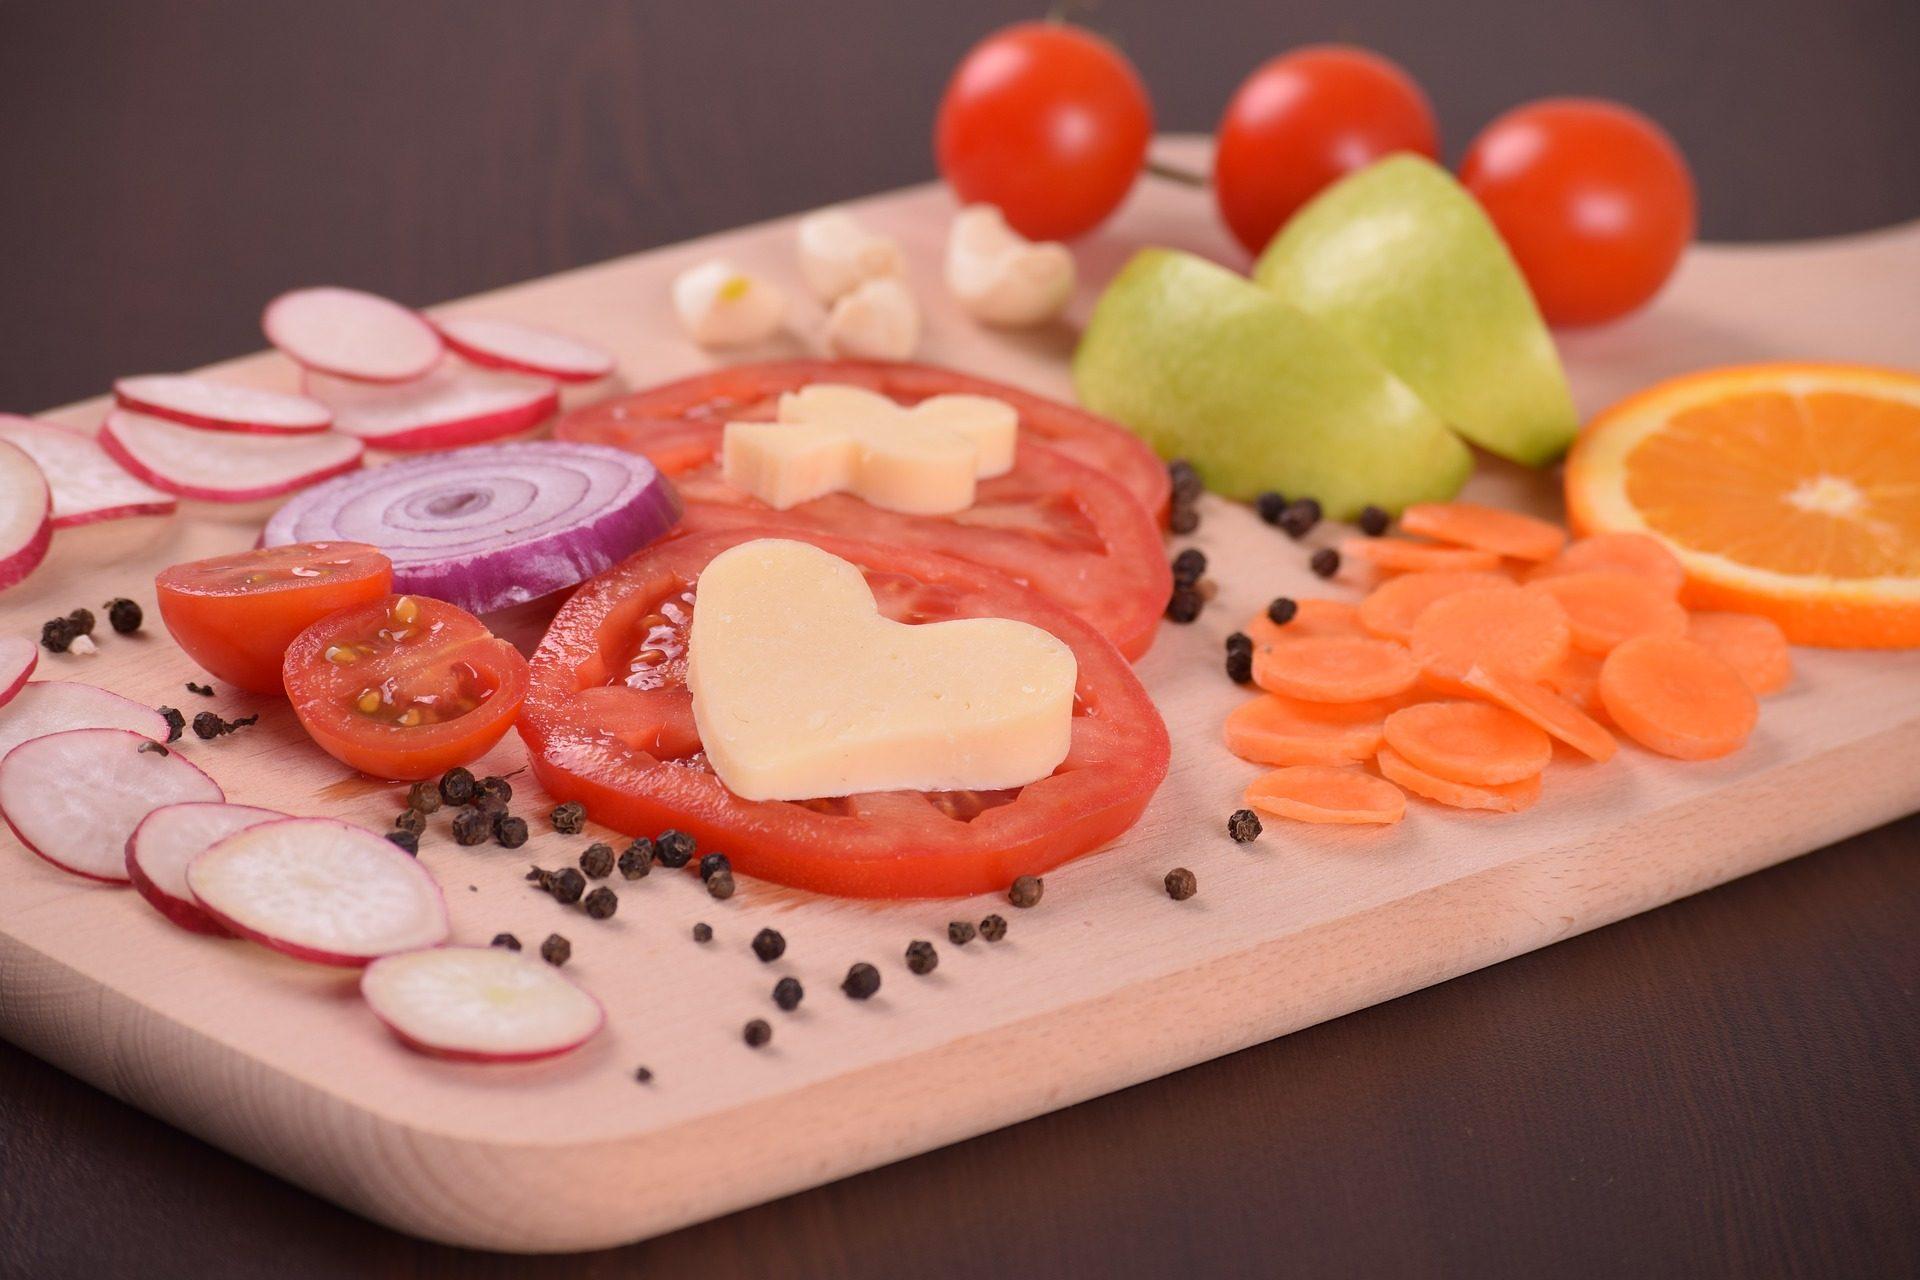 Salade, légume, fruits, tomate, Oignon, jus de carotte, Orange - Fonds d'écran HD - Professor-falken.com